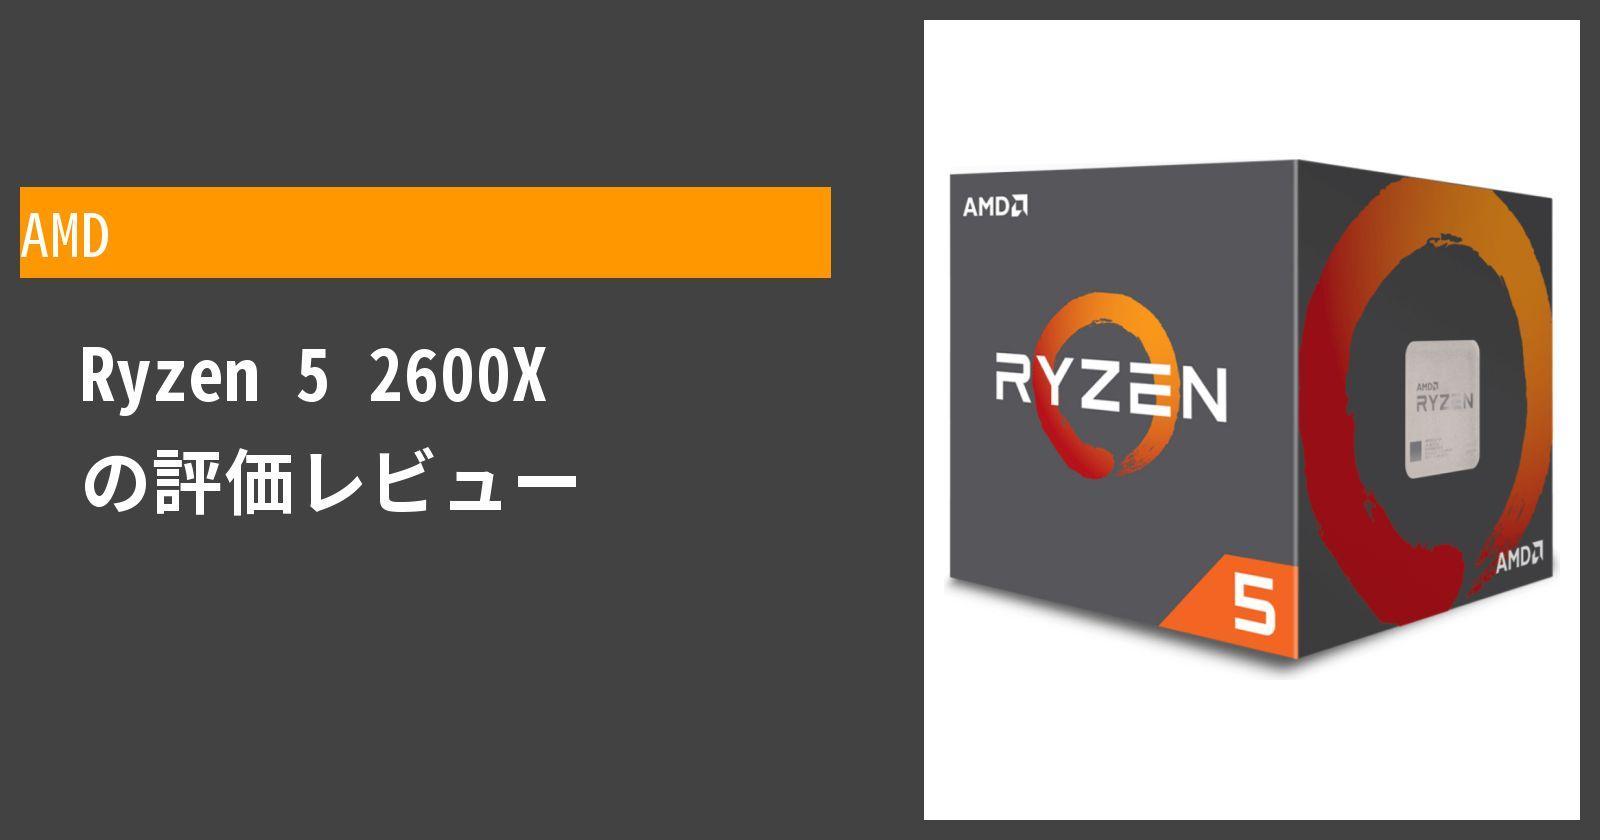 Ryzen 5 2600Xを徹底評価